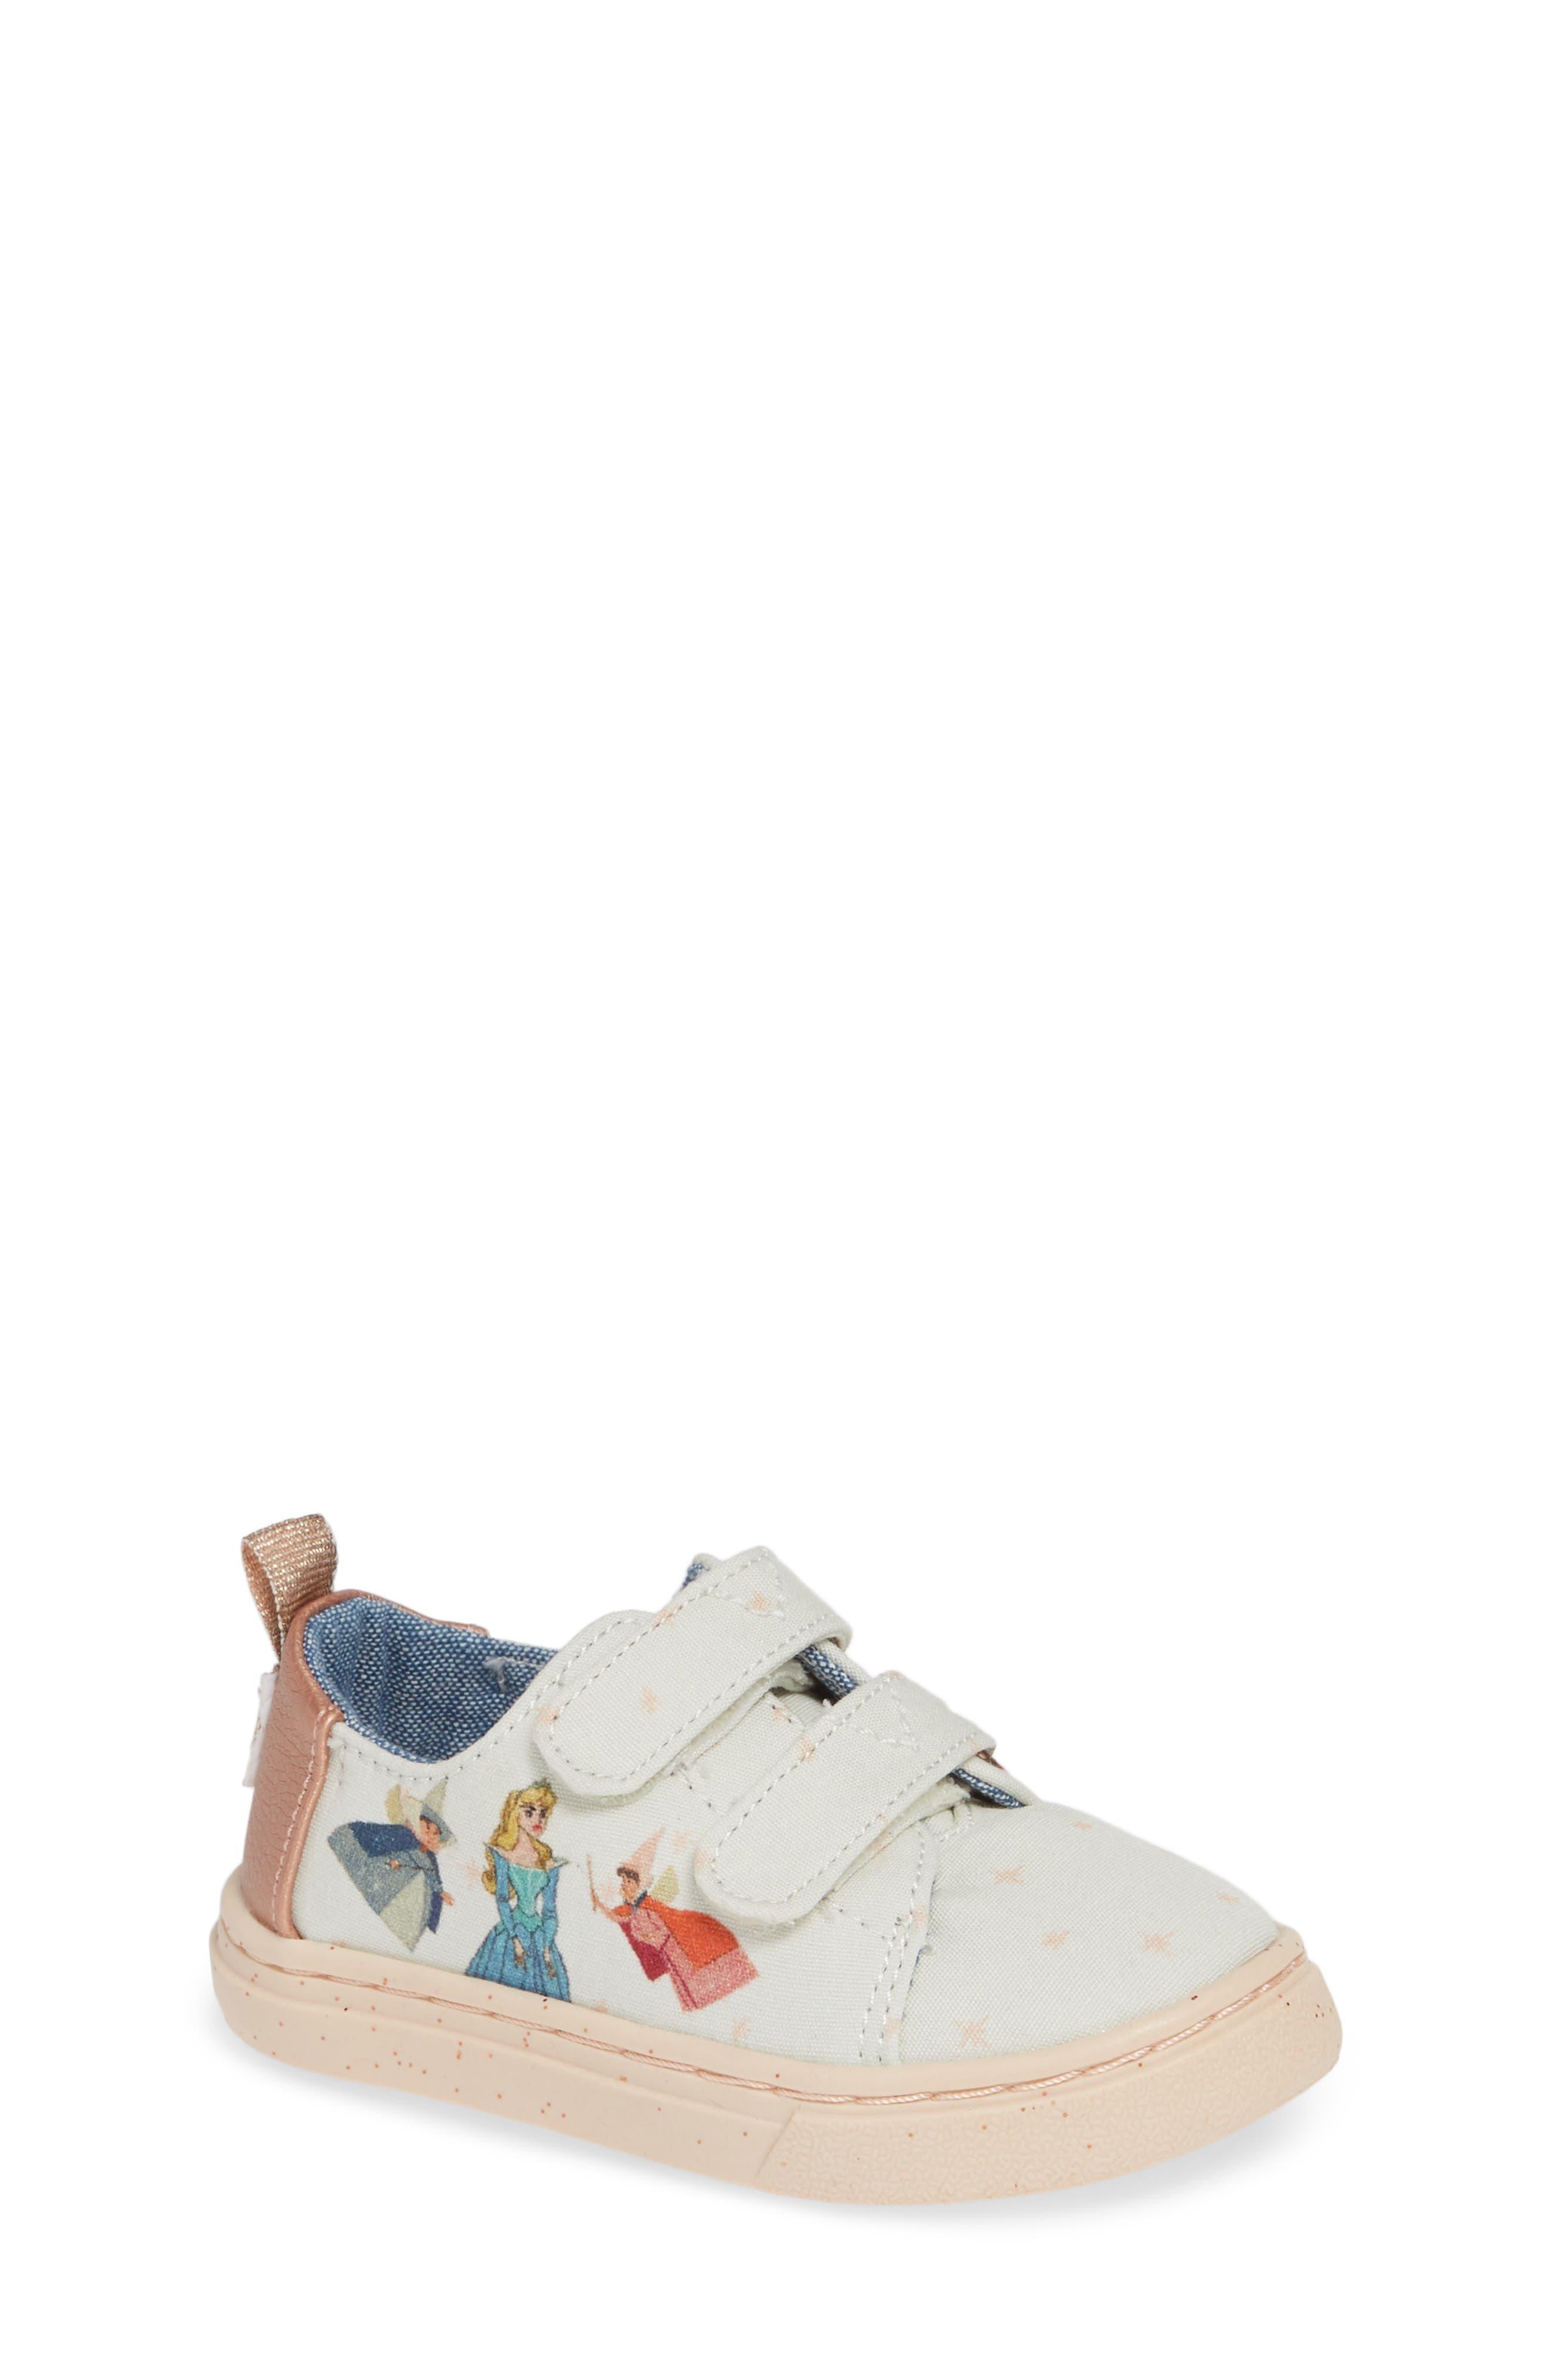 x Disney Tiny Lenny Sneaker,                             Main thumbnail 1, color,                             900